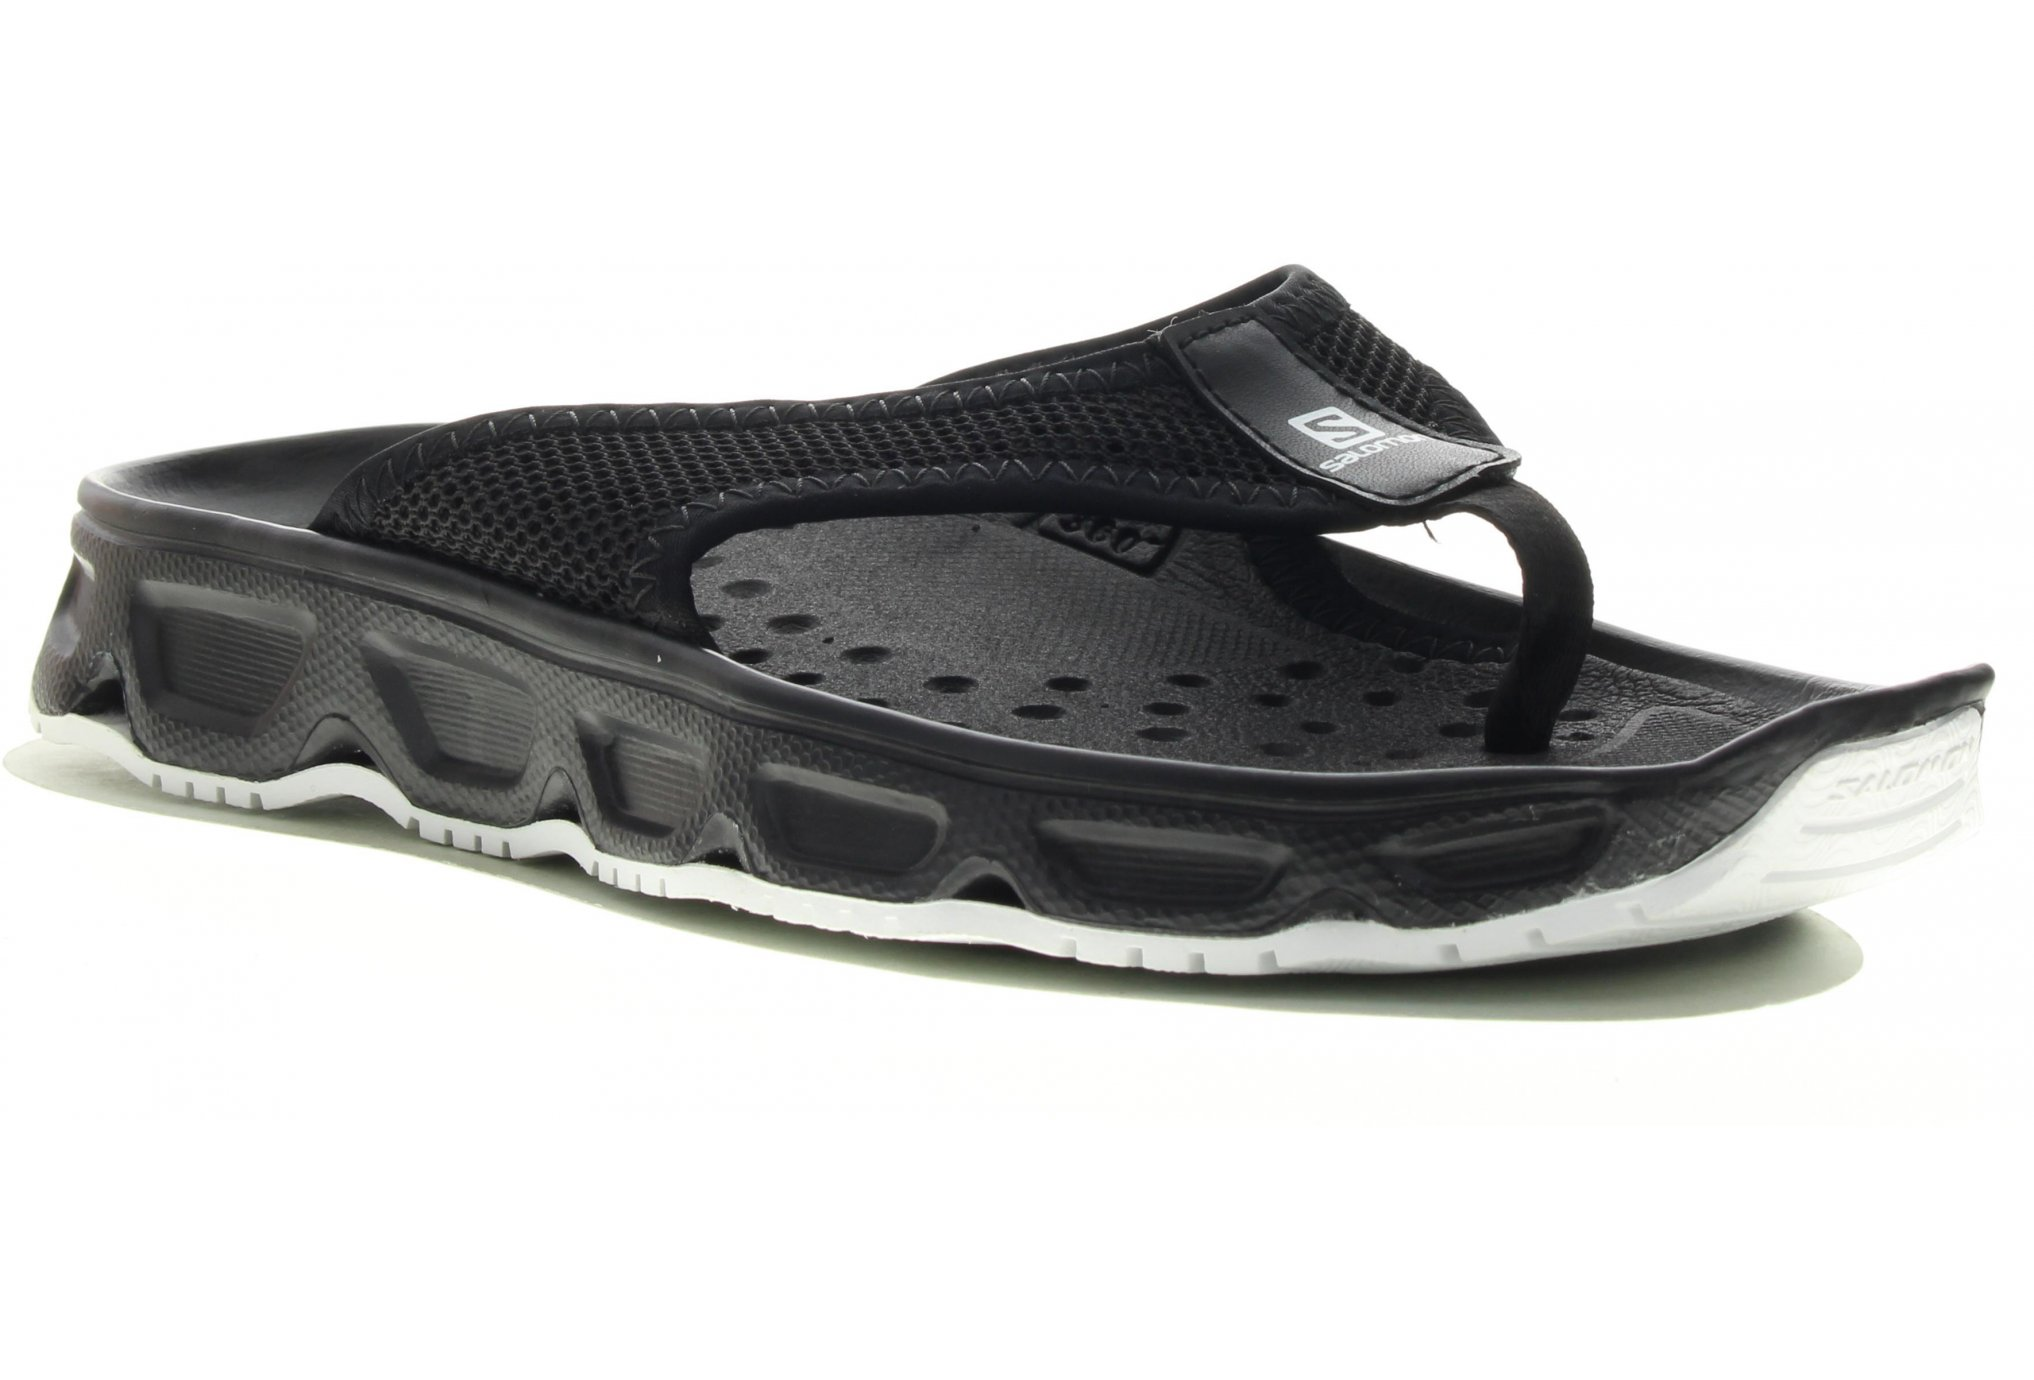 Salomon RX Break 4.0 M Chaussures homme